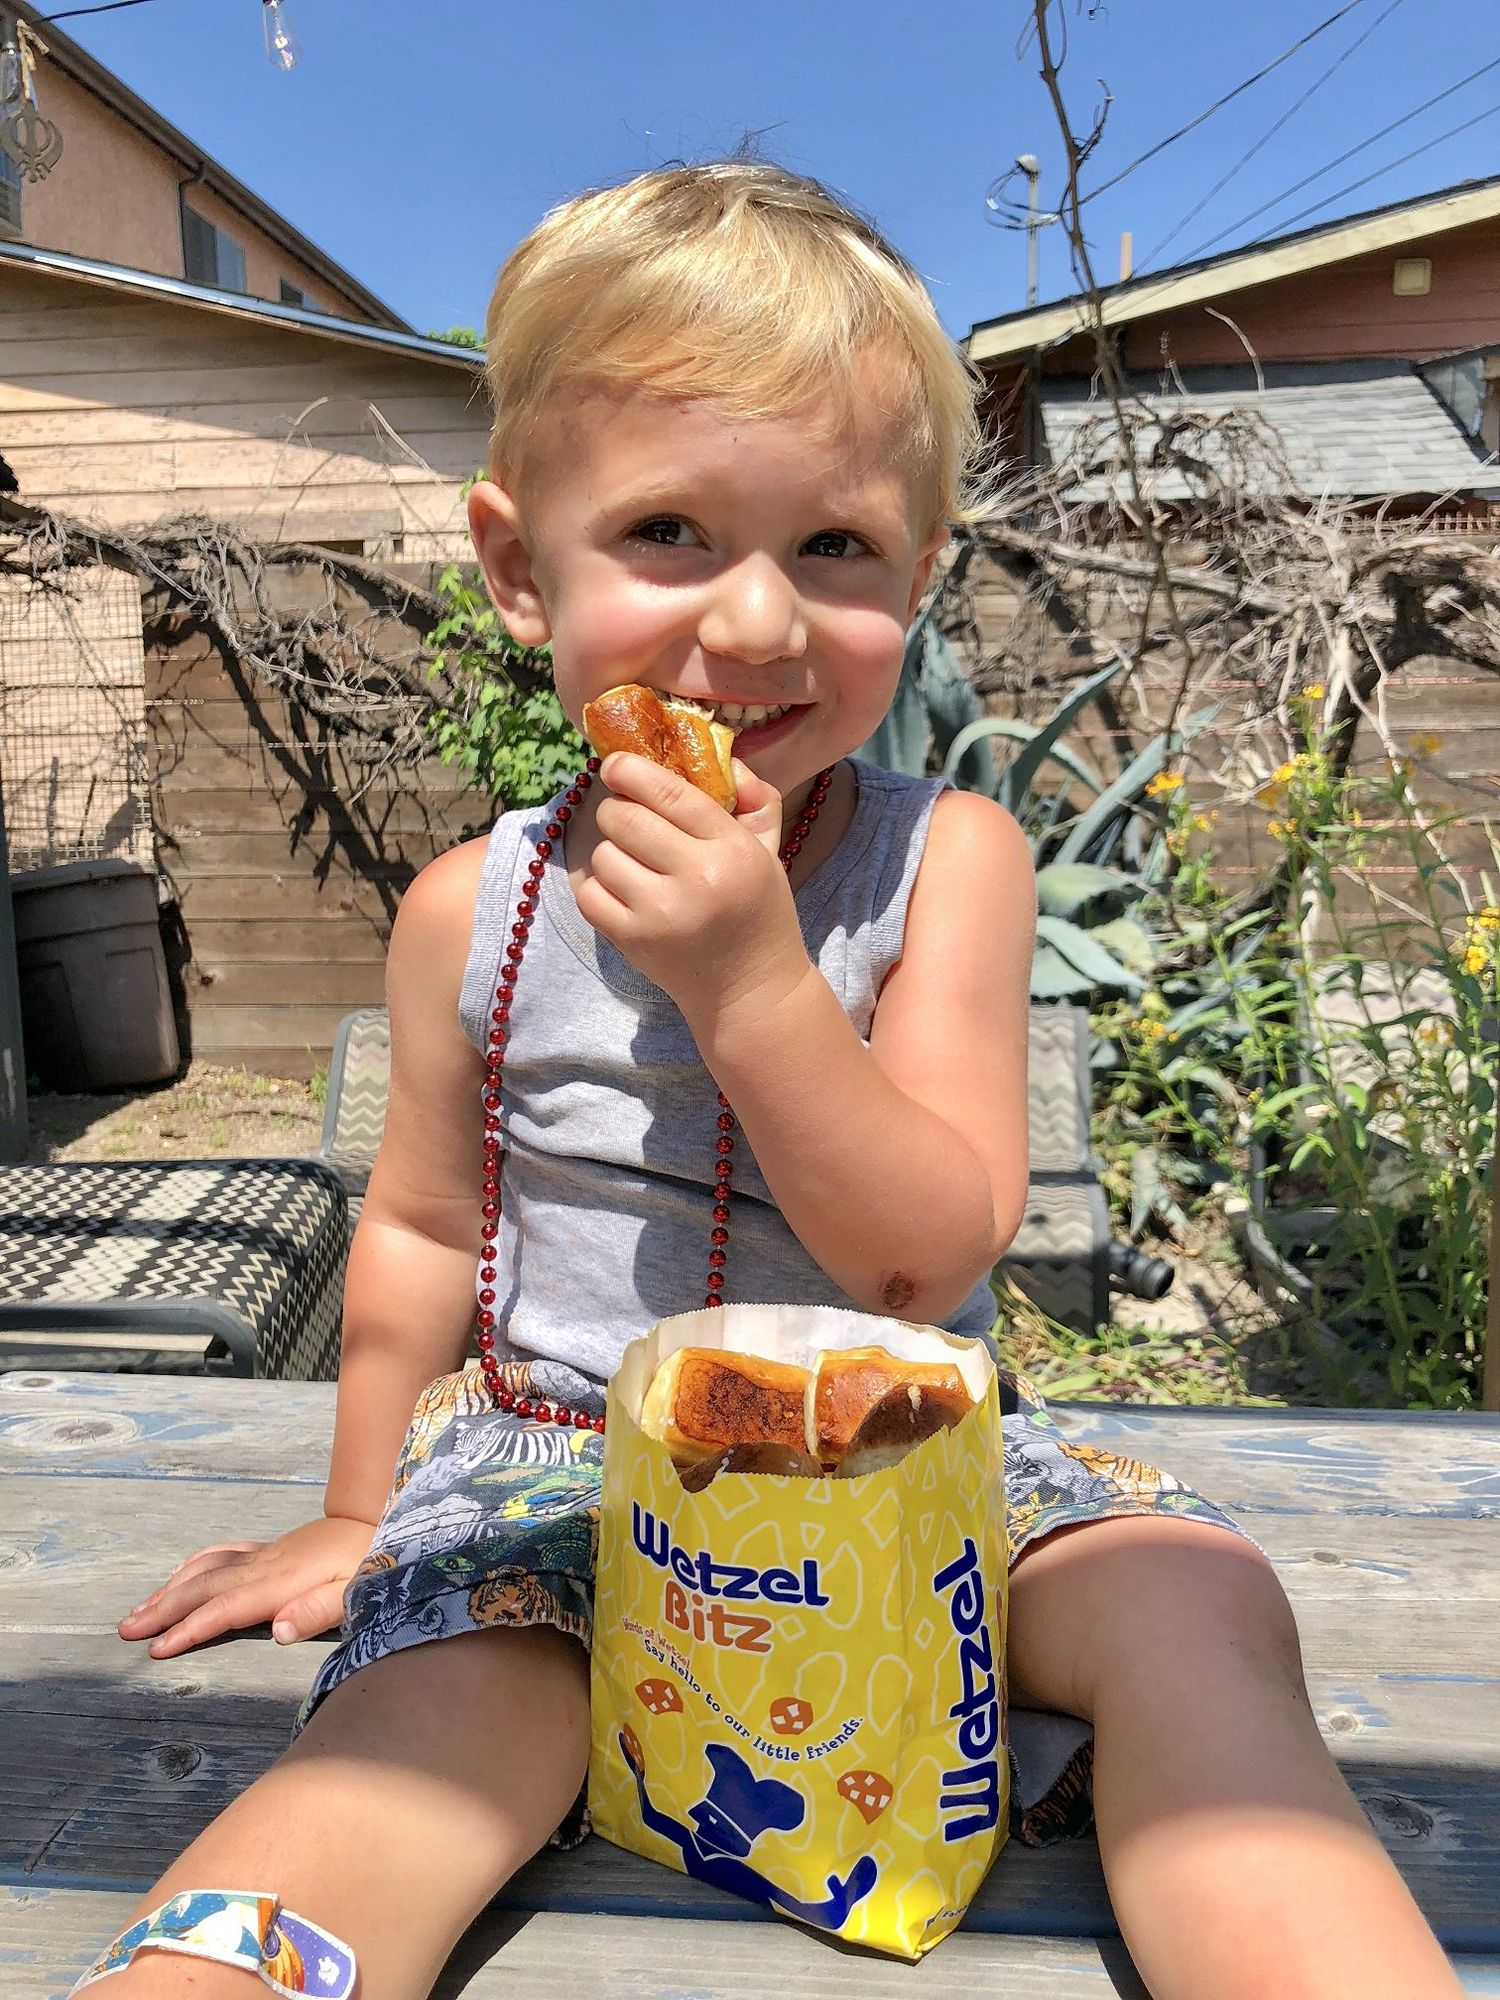 Wetzel's Pretzels Donates More Than $100,000 to Fight Childhood Hunger